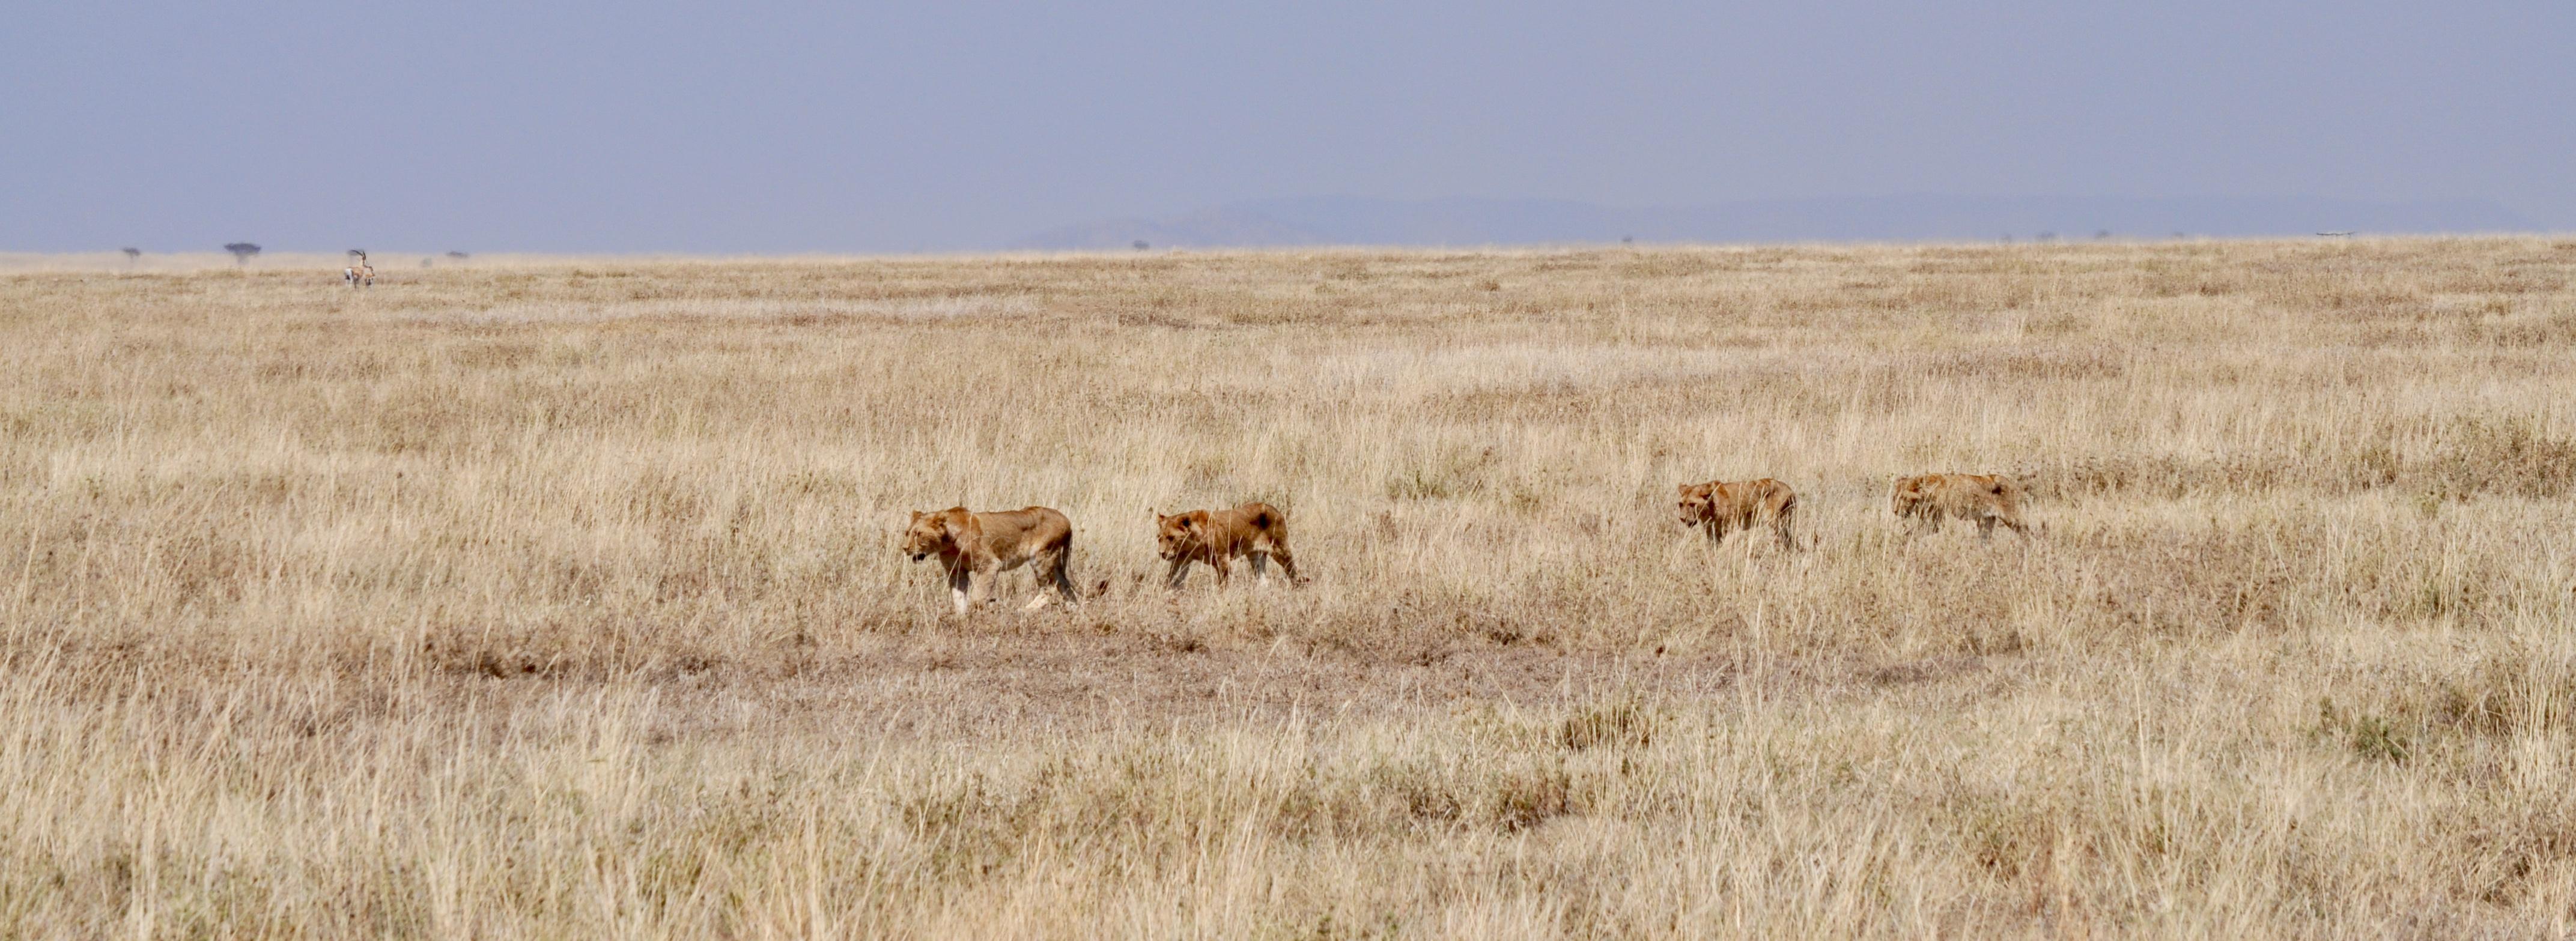 Southern Africa Safari-15 Days-El Mundo Safaris